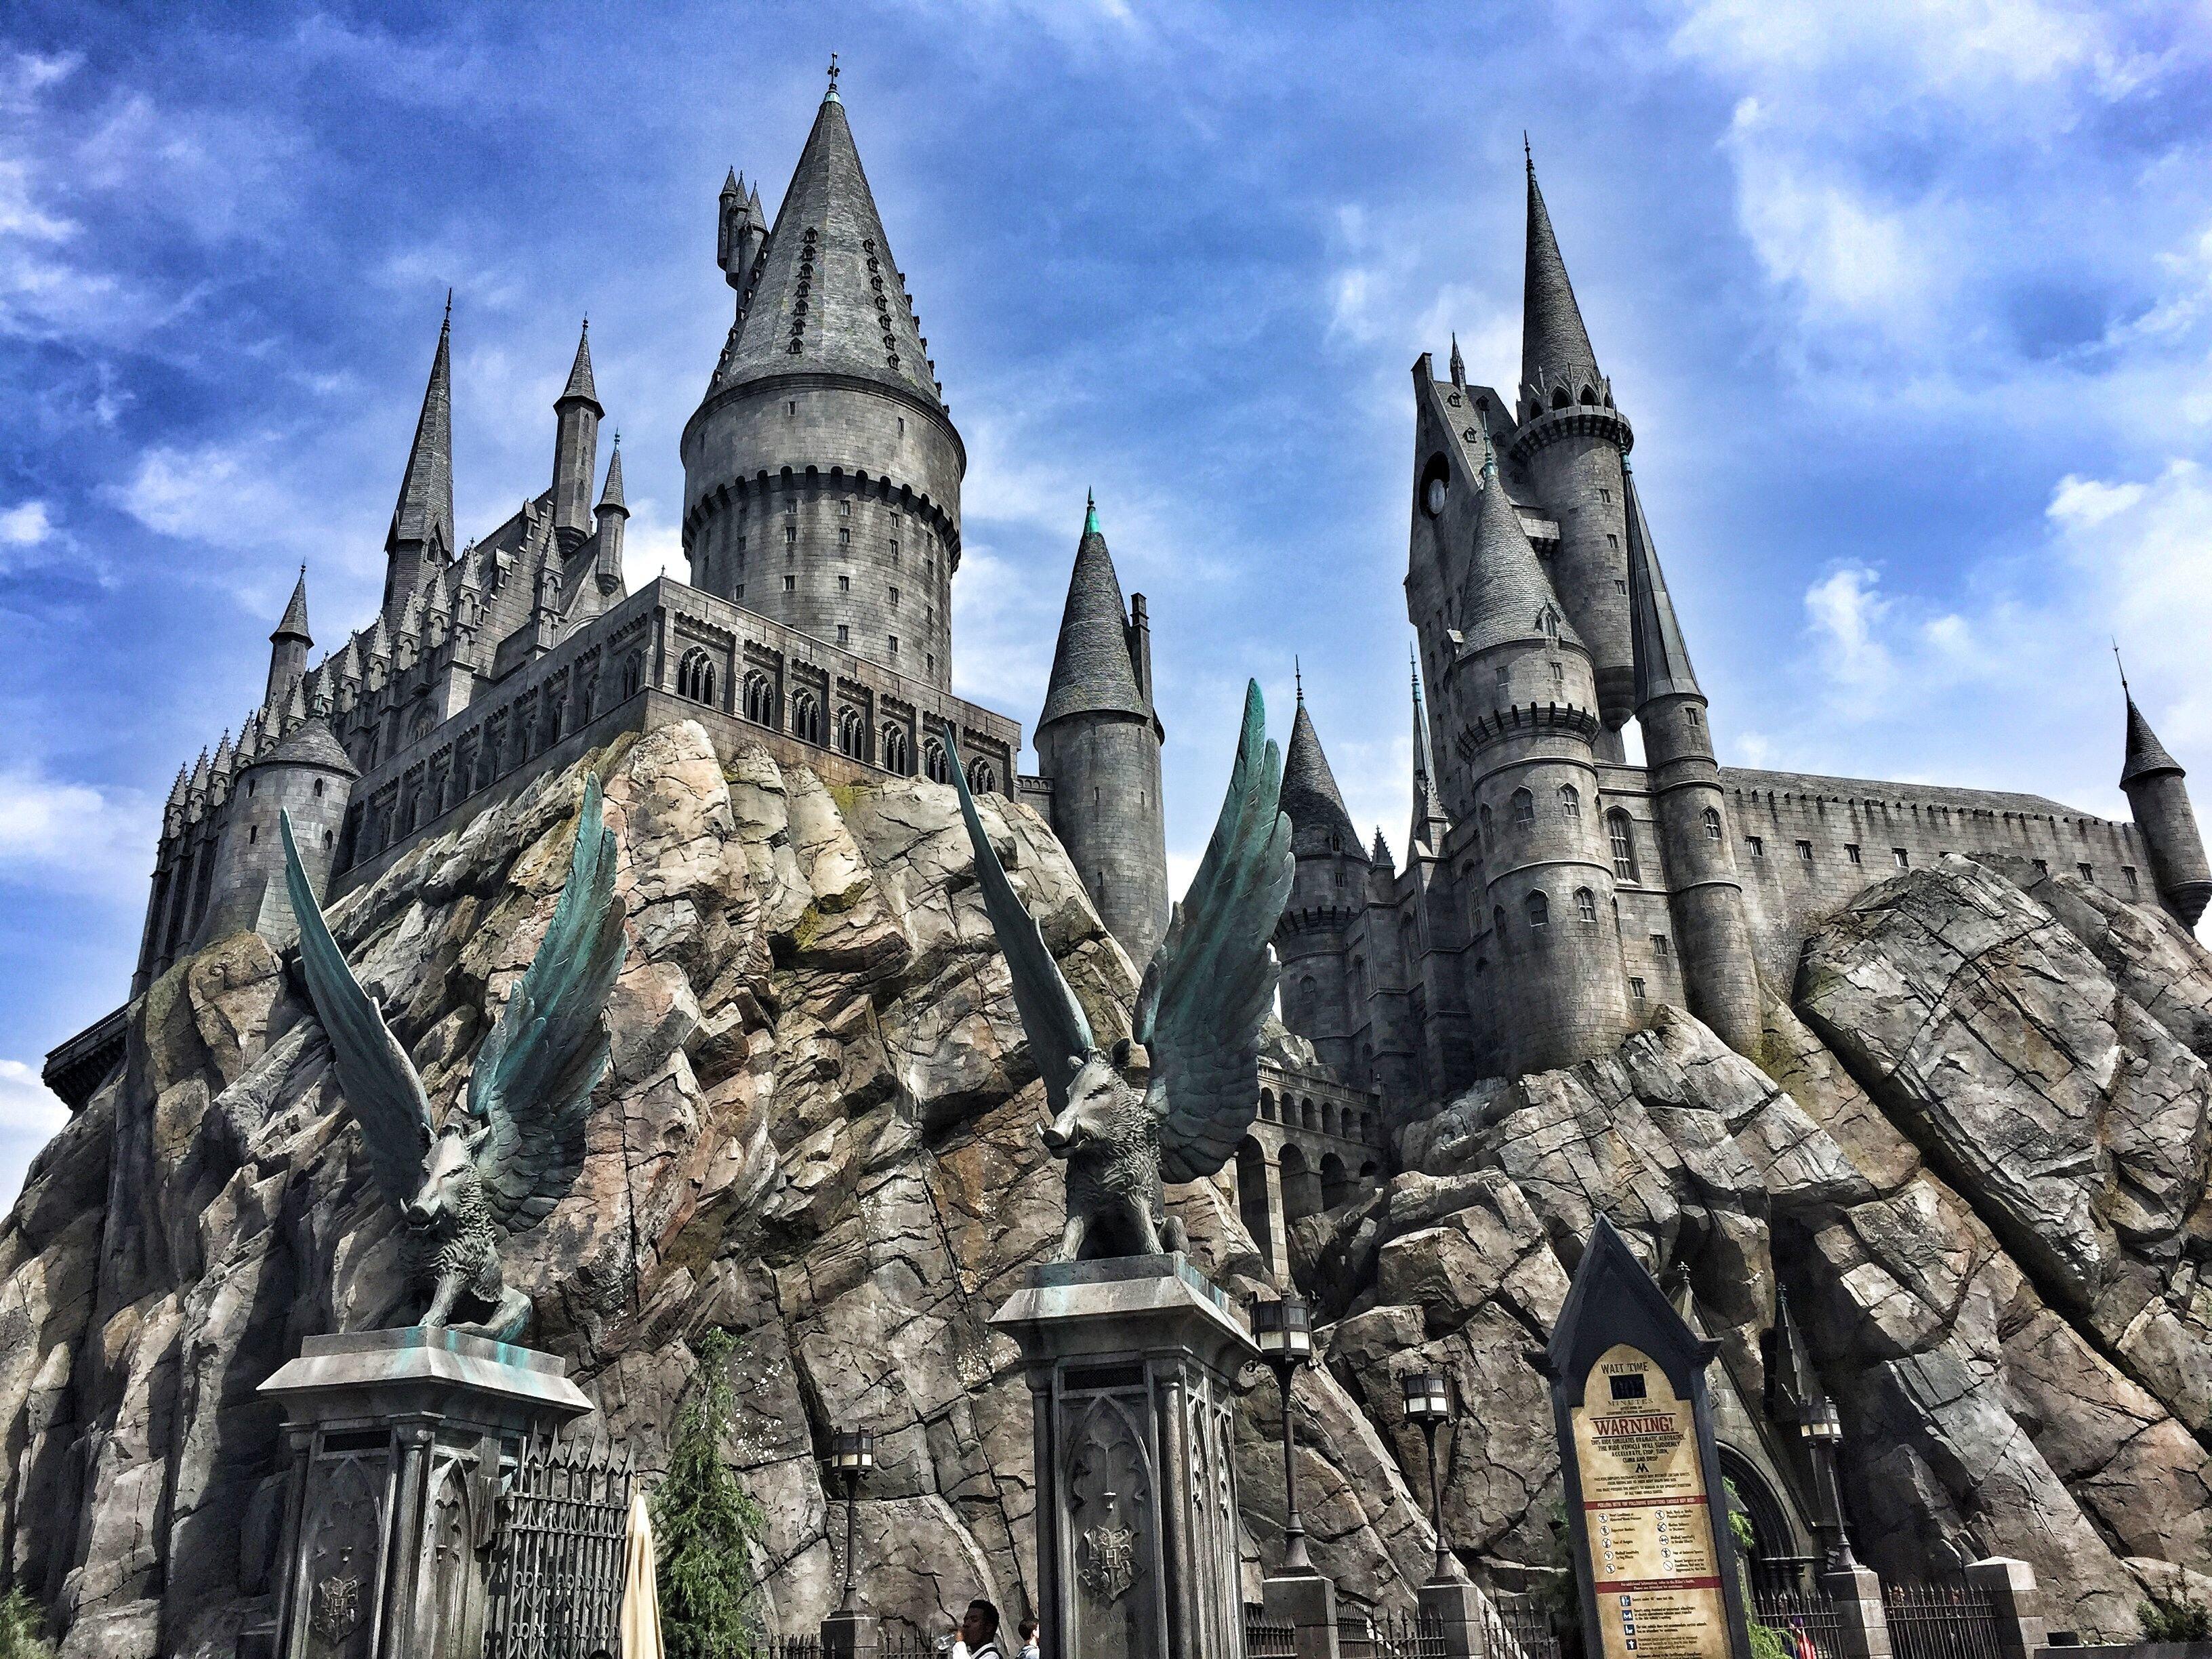 'Harry Potter' Fans Horrified By Grim Pottermore Tweet About Hogwarts Plumbing